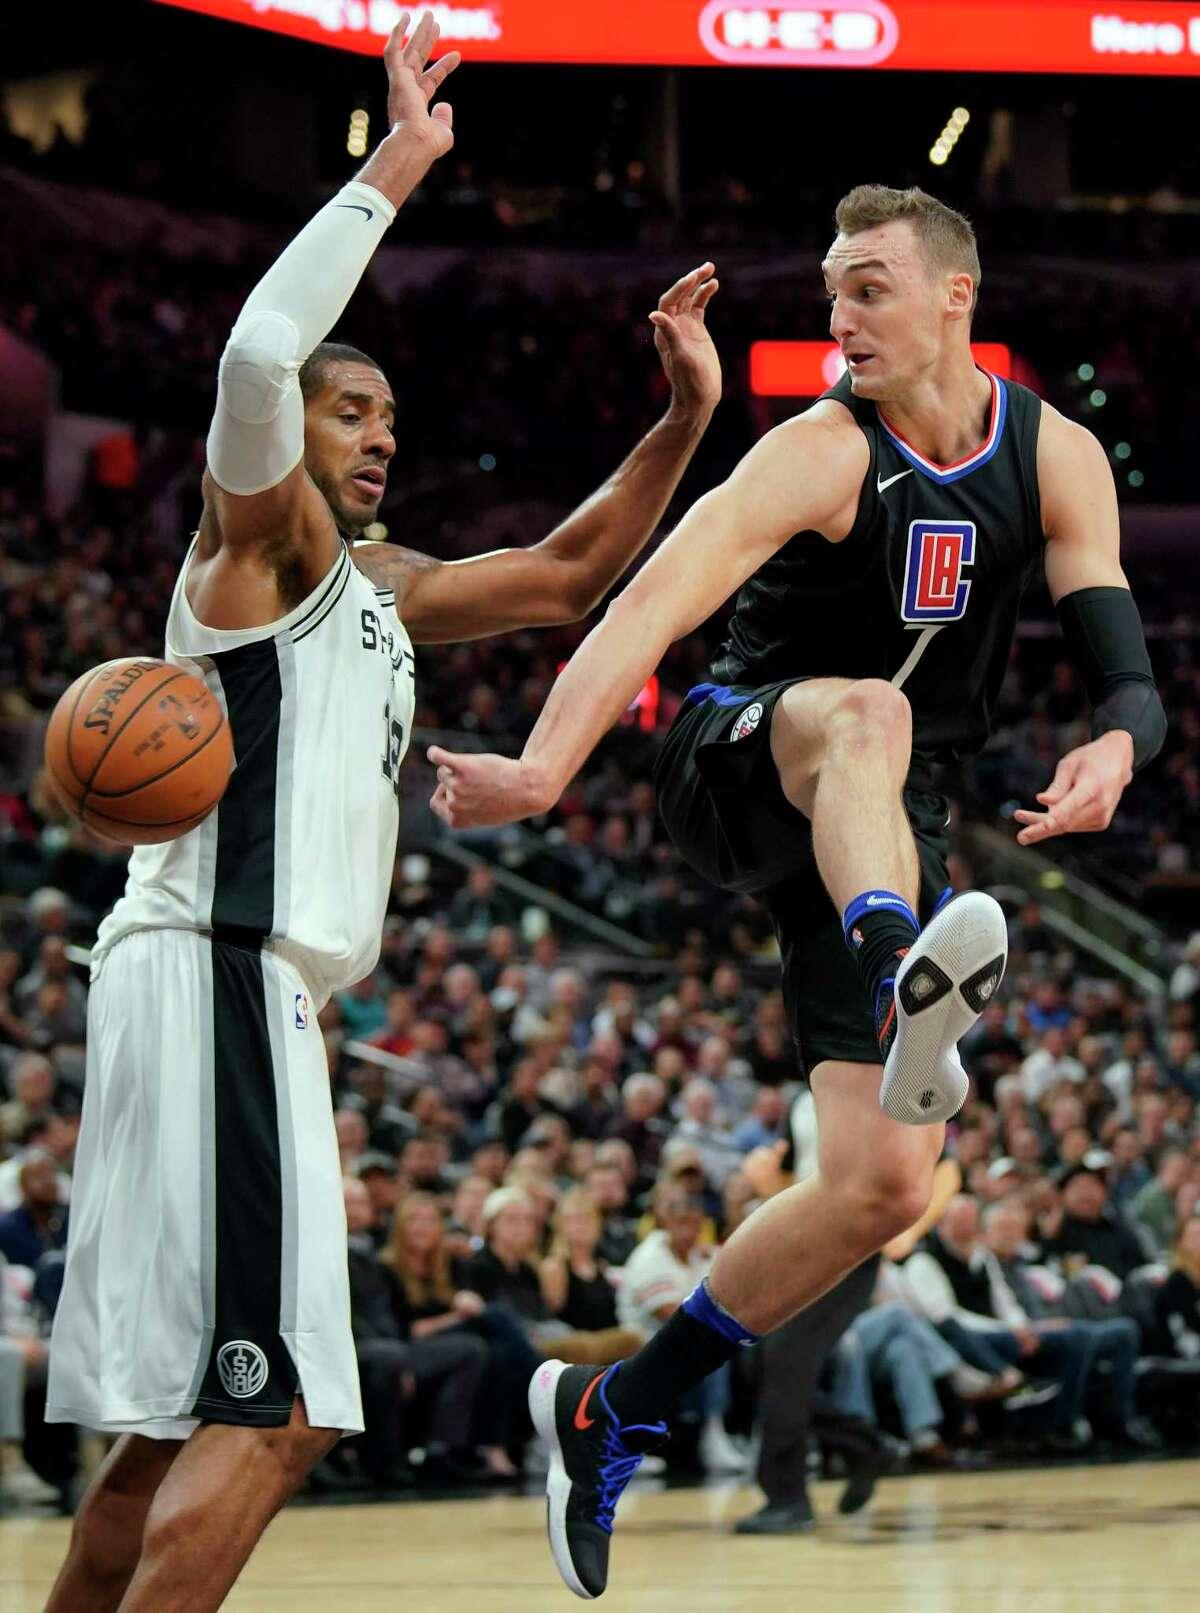 Los Angeles Clippers forward Sam Dekker, right, passes around San Antonio Spurs forward LaMarcus Aldridge during the first half of an NBA basketball game, Monday, Dec. 18, 2017, in San Antonio. (AP Photo/Darren Abate)